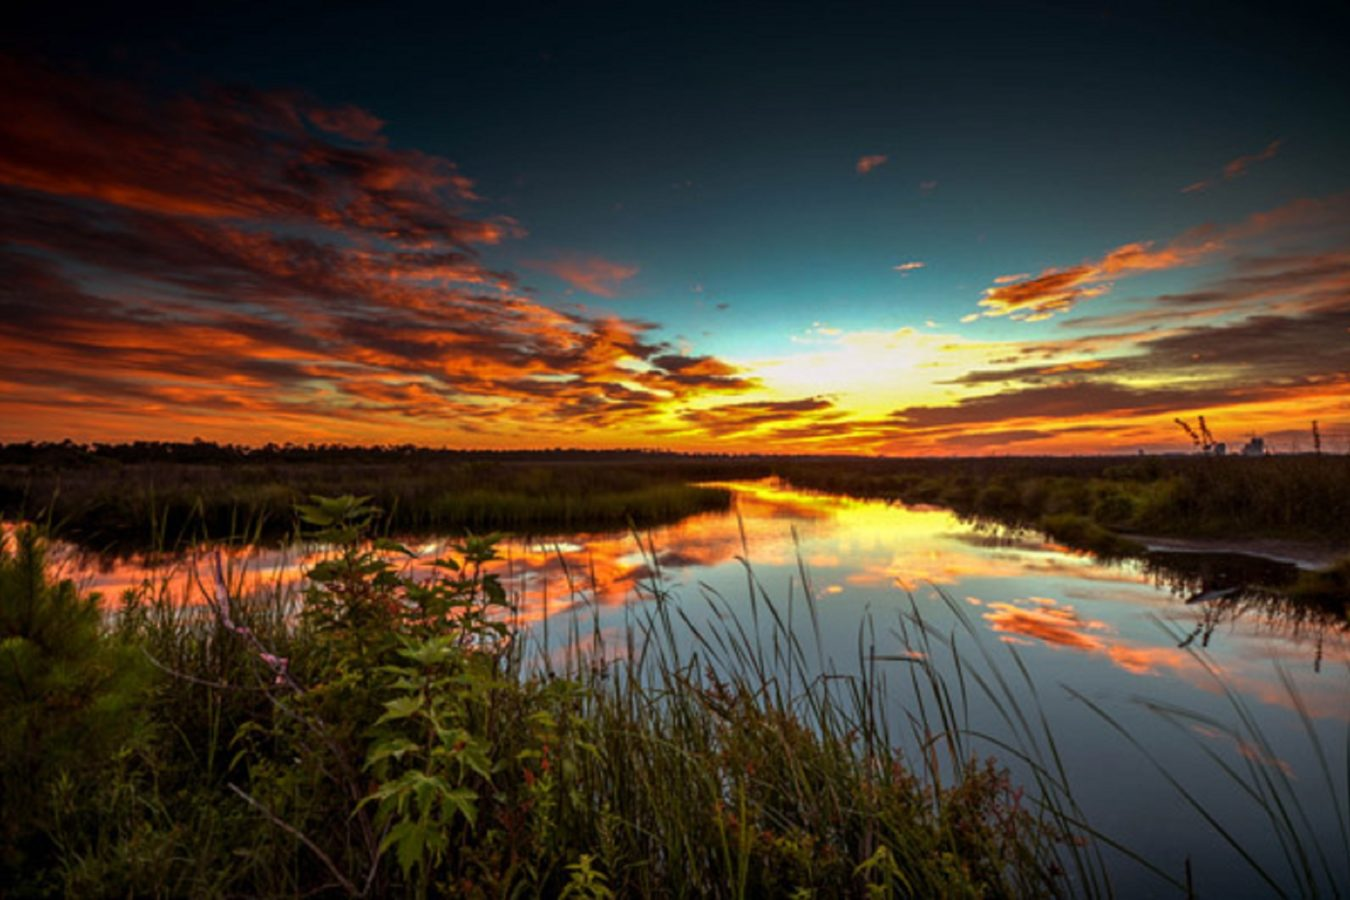 Lake Shelby Colored Sky Sunrise